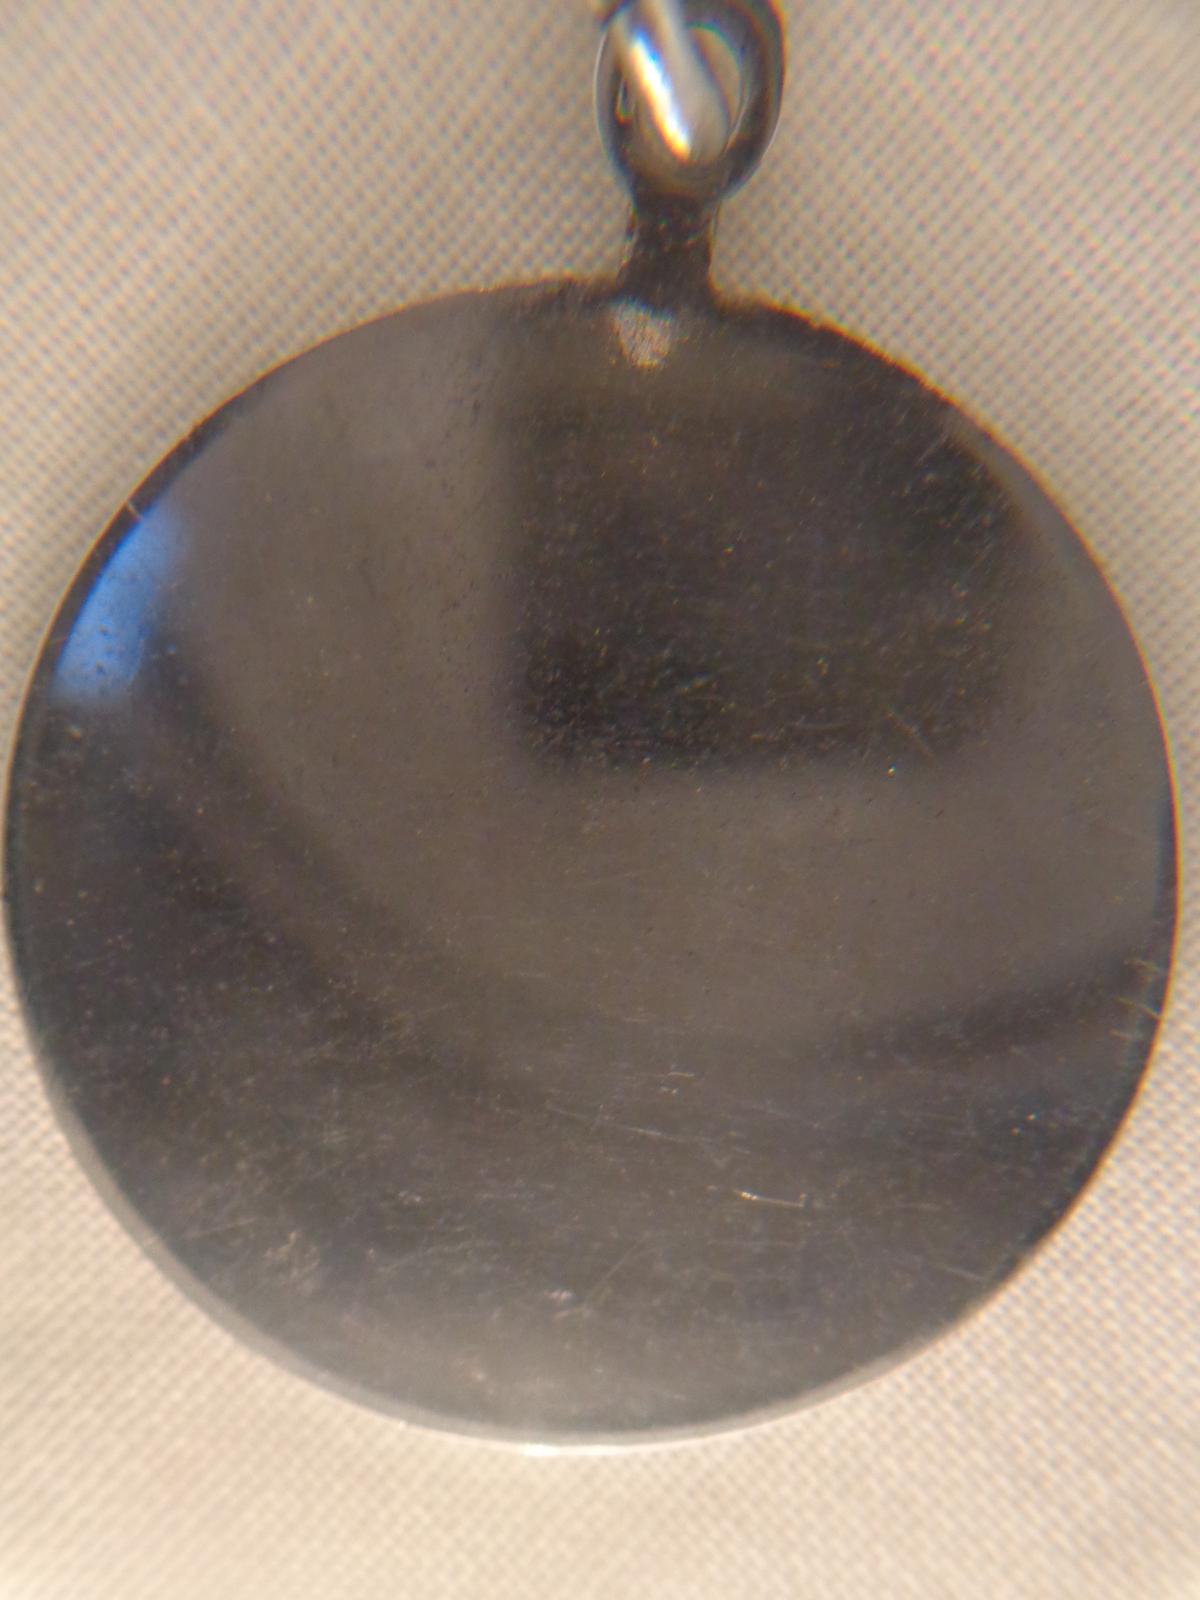 GRAND OLE OPRY SOUVENIR PENDANT (#1804)